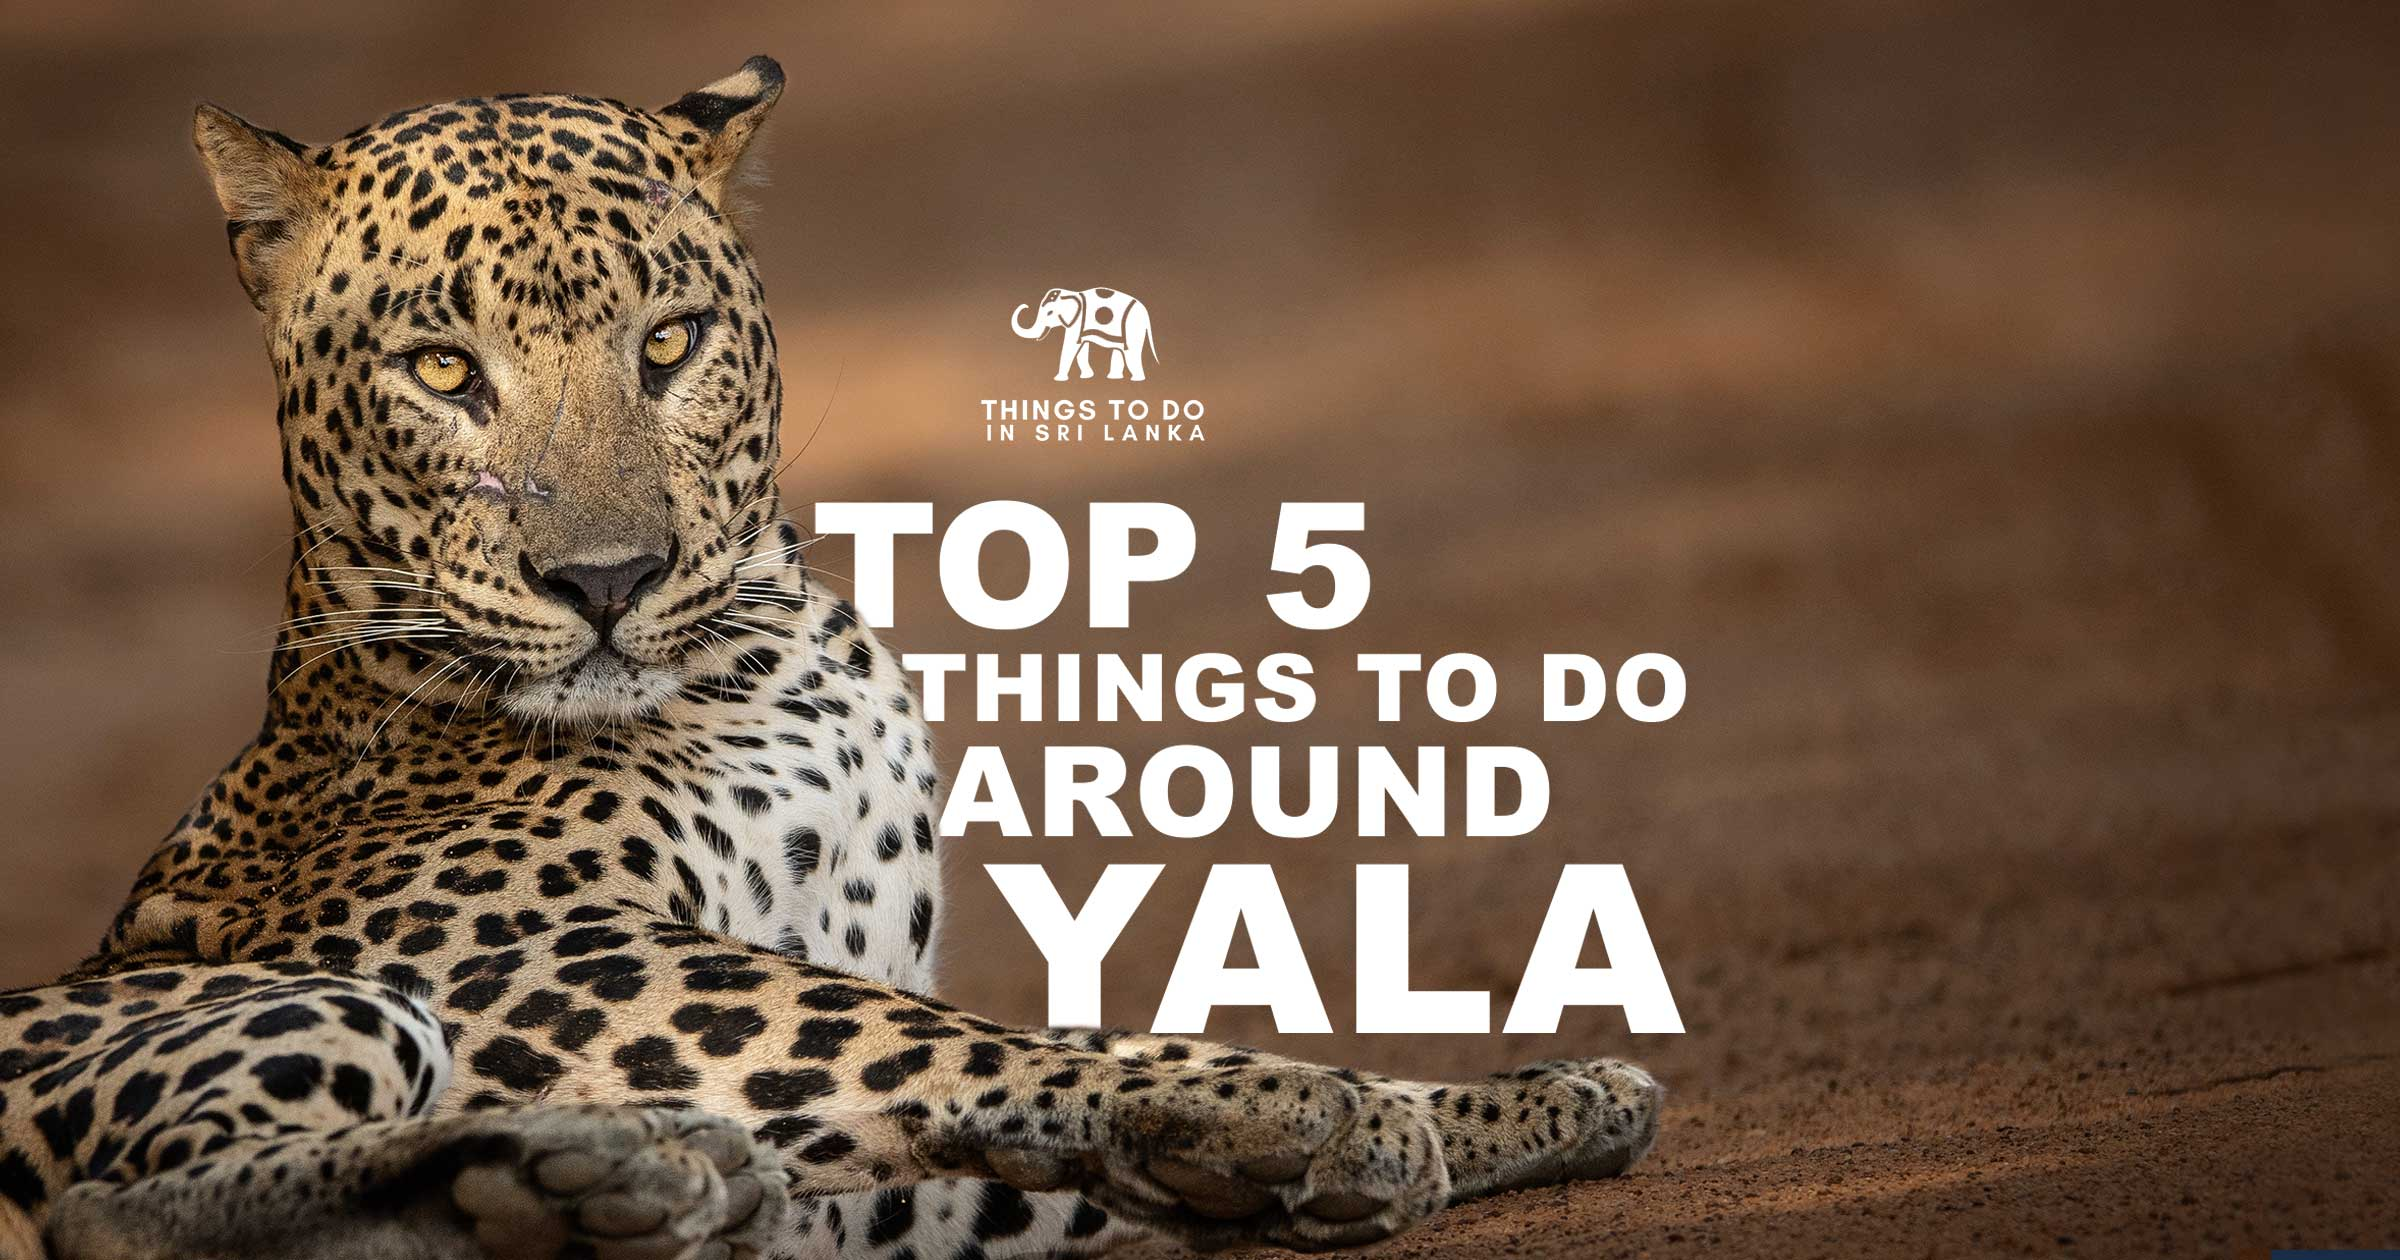 Top 5 things to do Around Yala